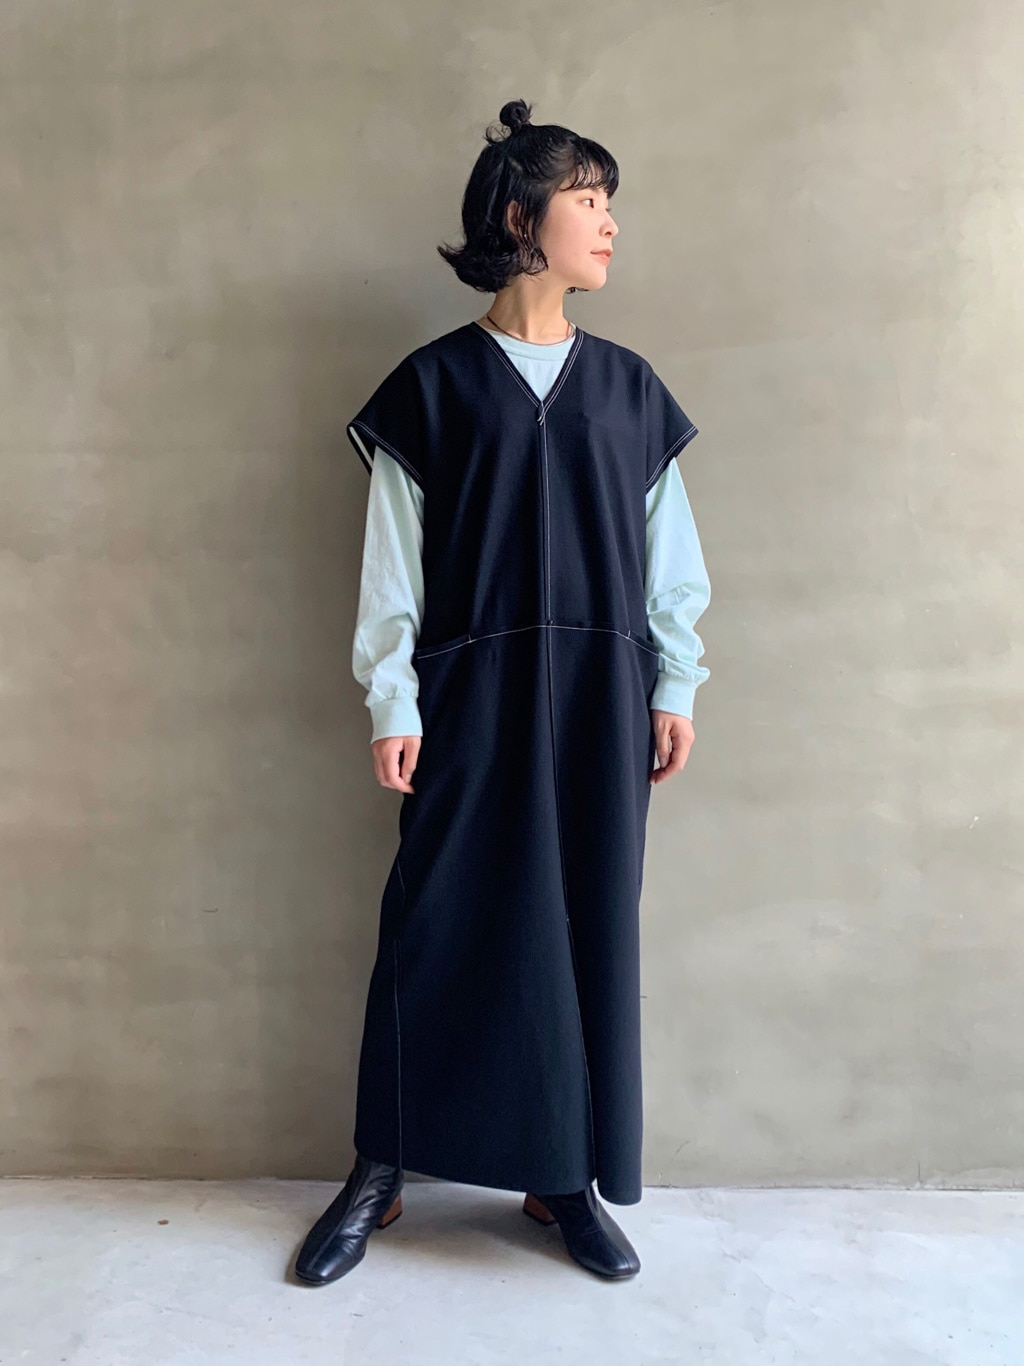 caph troupe 福岡薬院路面 身長:155cm 2020.11.28